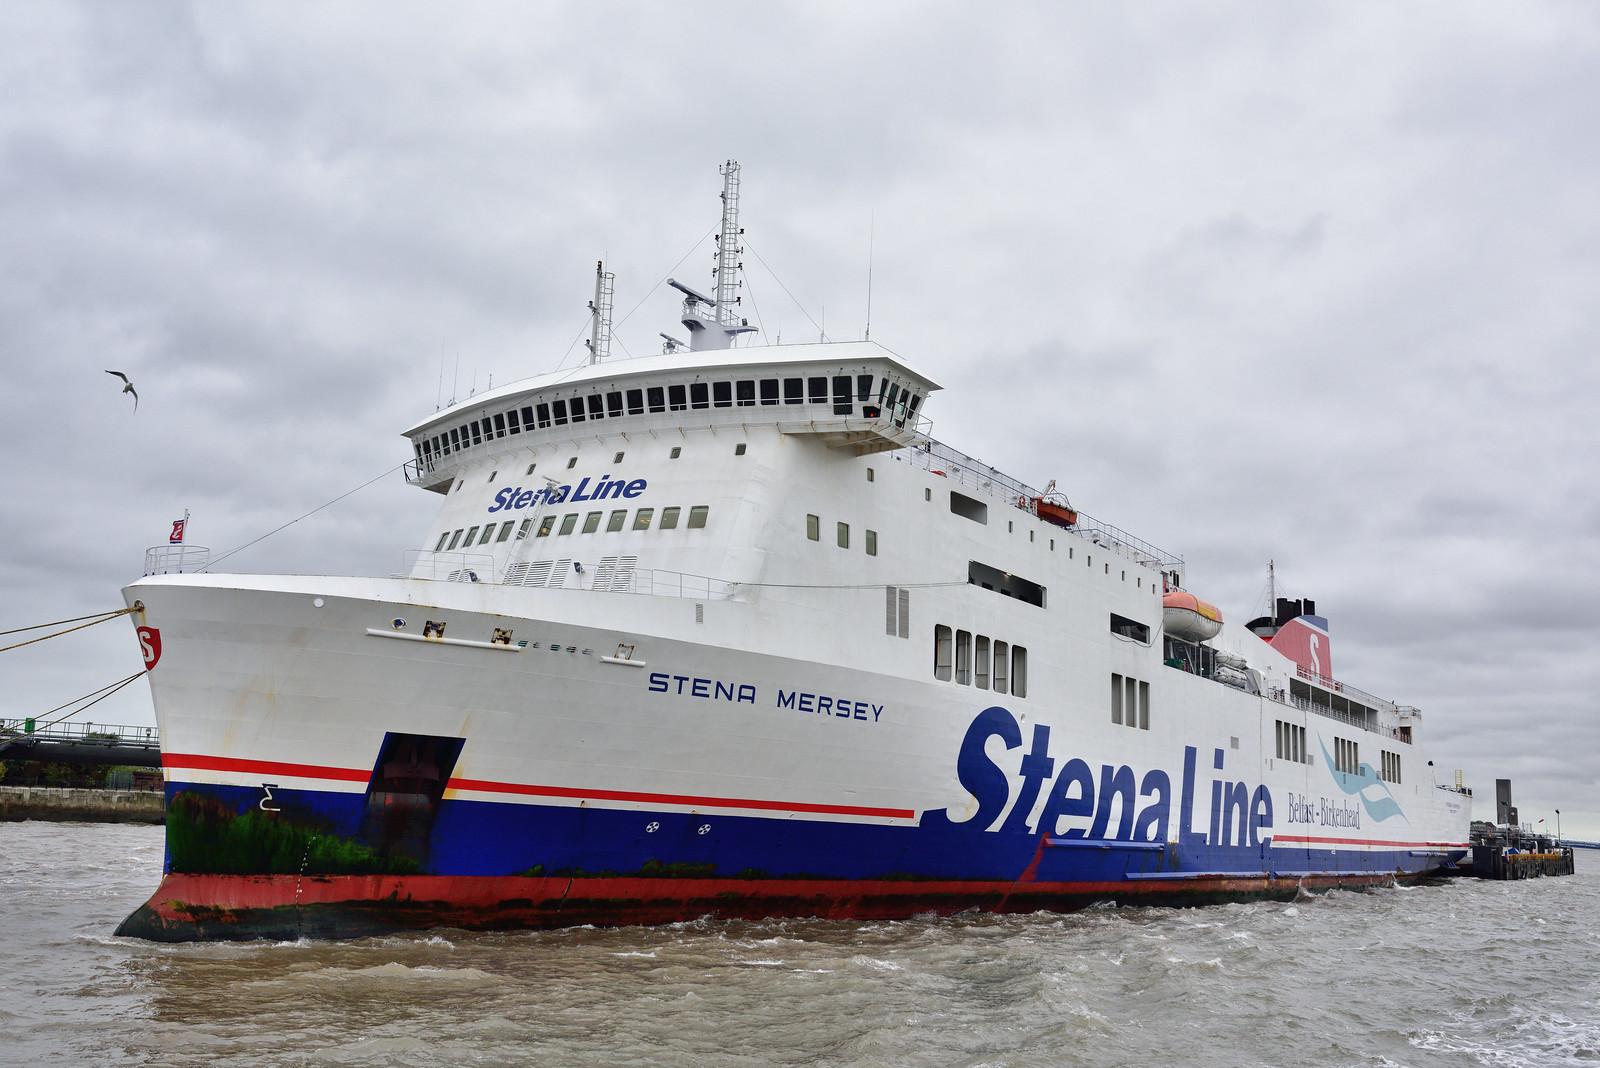 Belfast Ferry